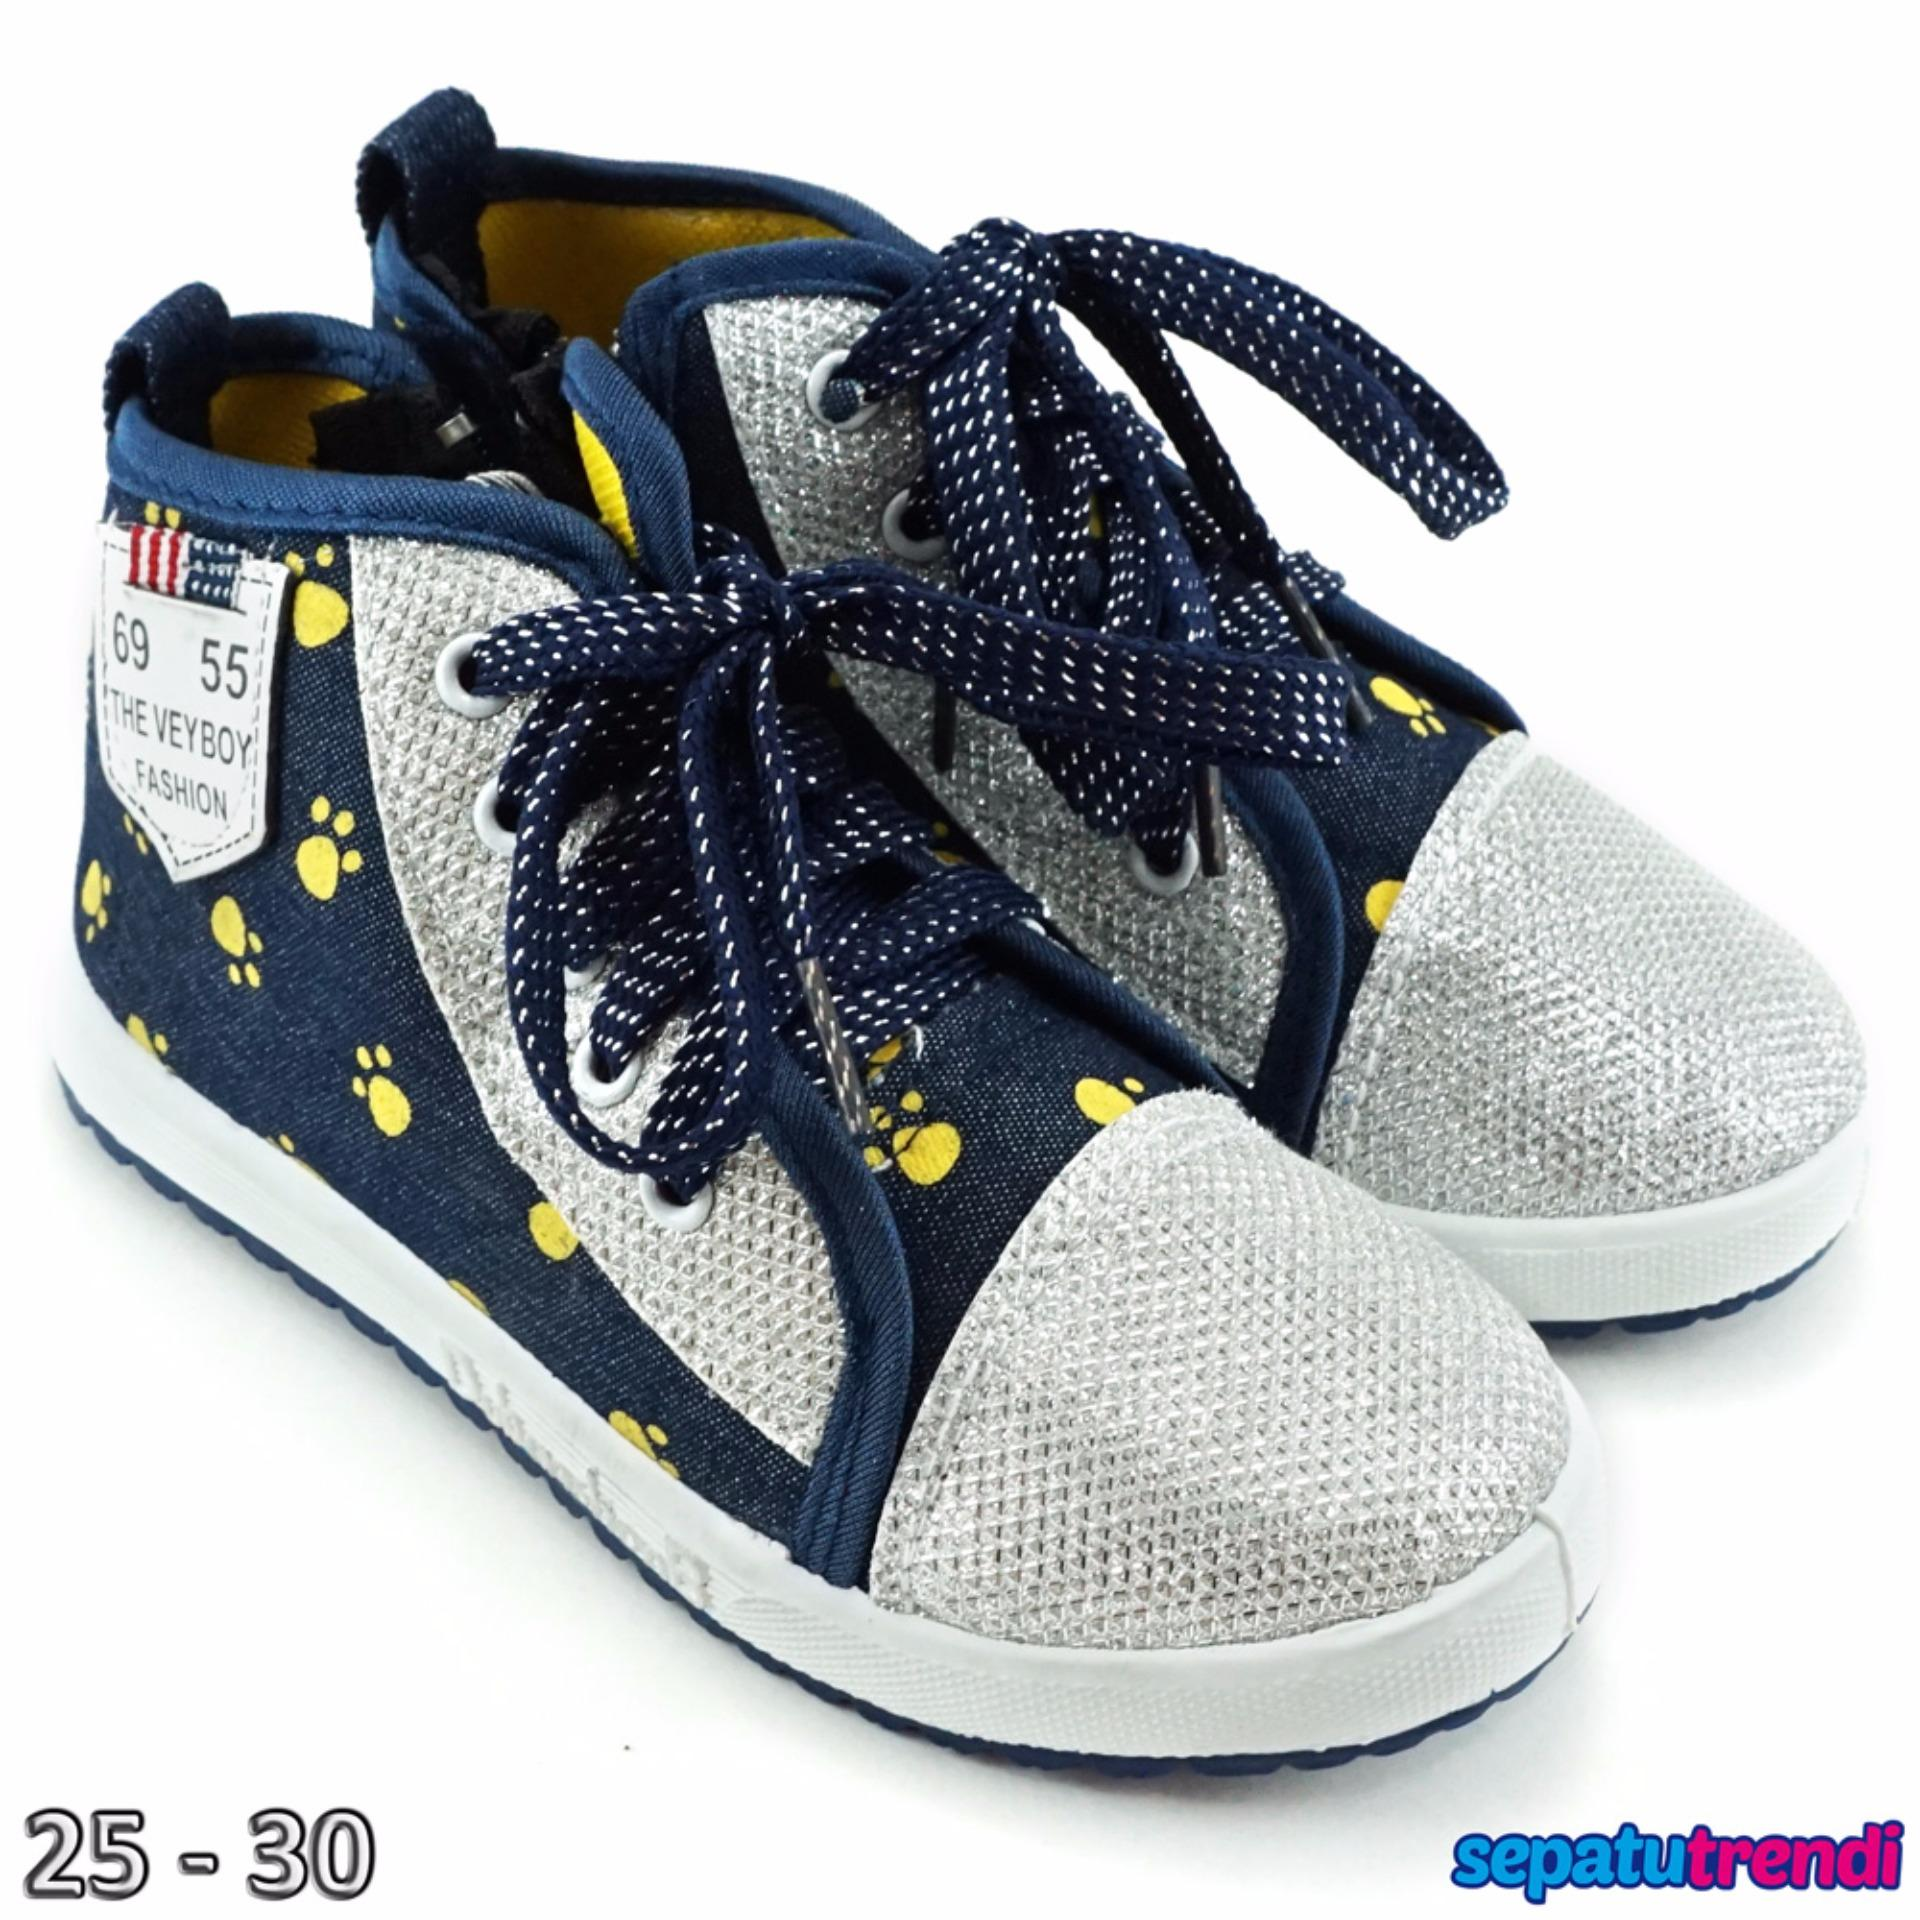 Toko Trendishoes Sepatu Boot Anak Cewe Denim Import Zipper Veysnw Lis Navy Murah Dki Jakarta